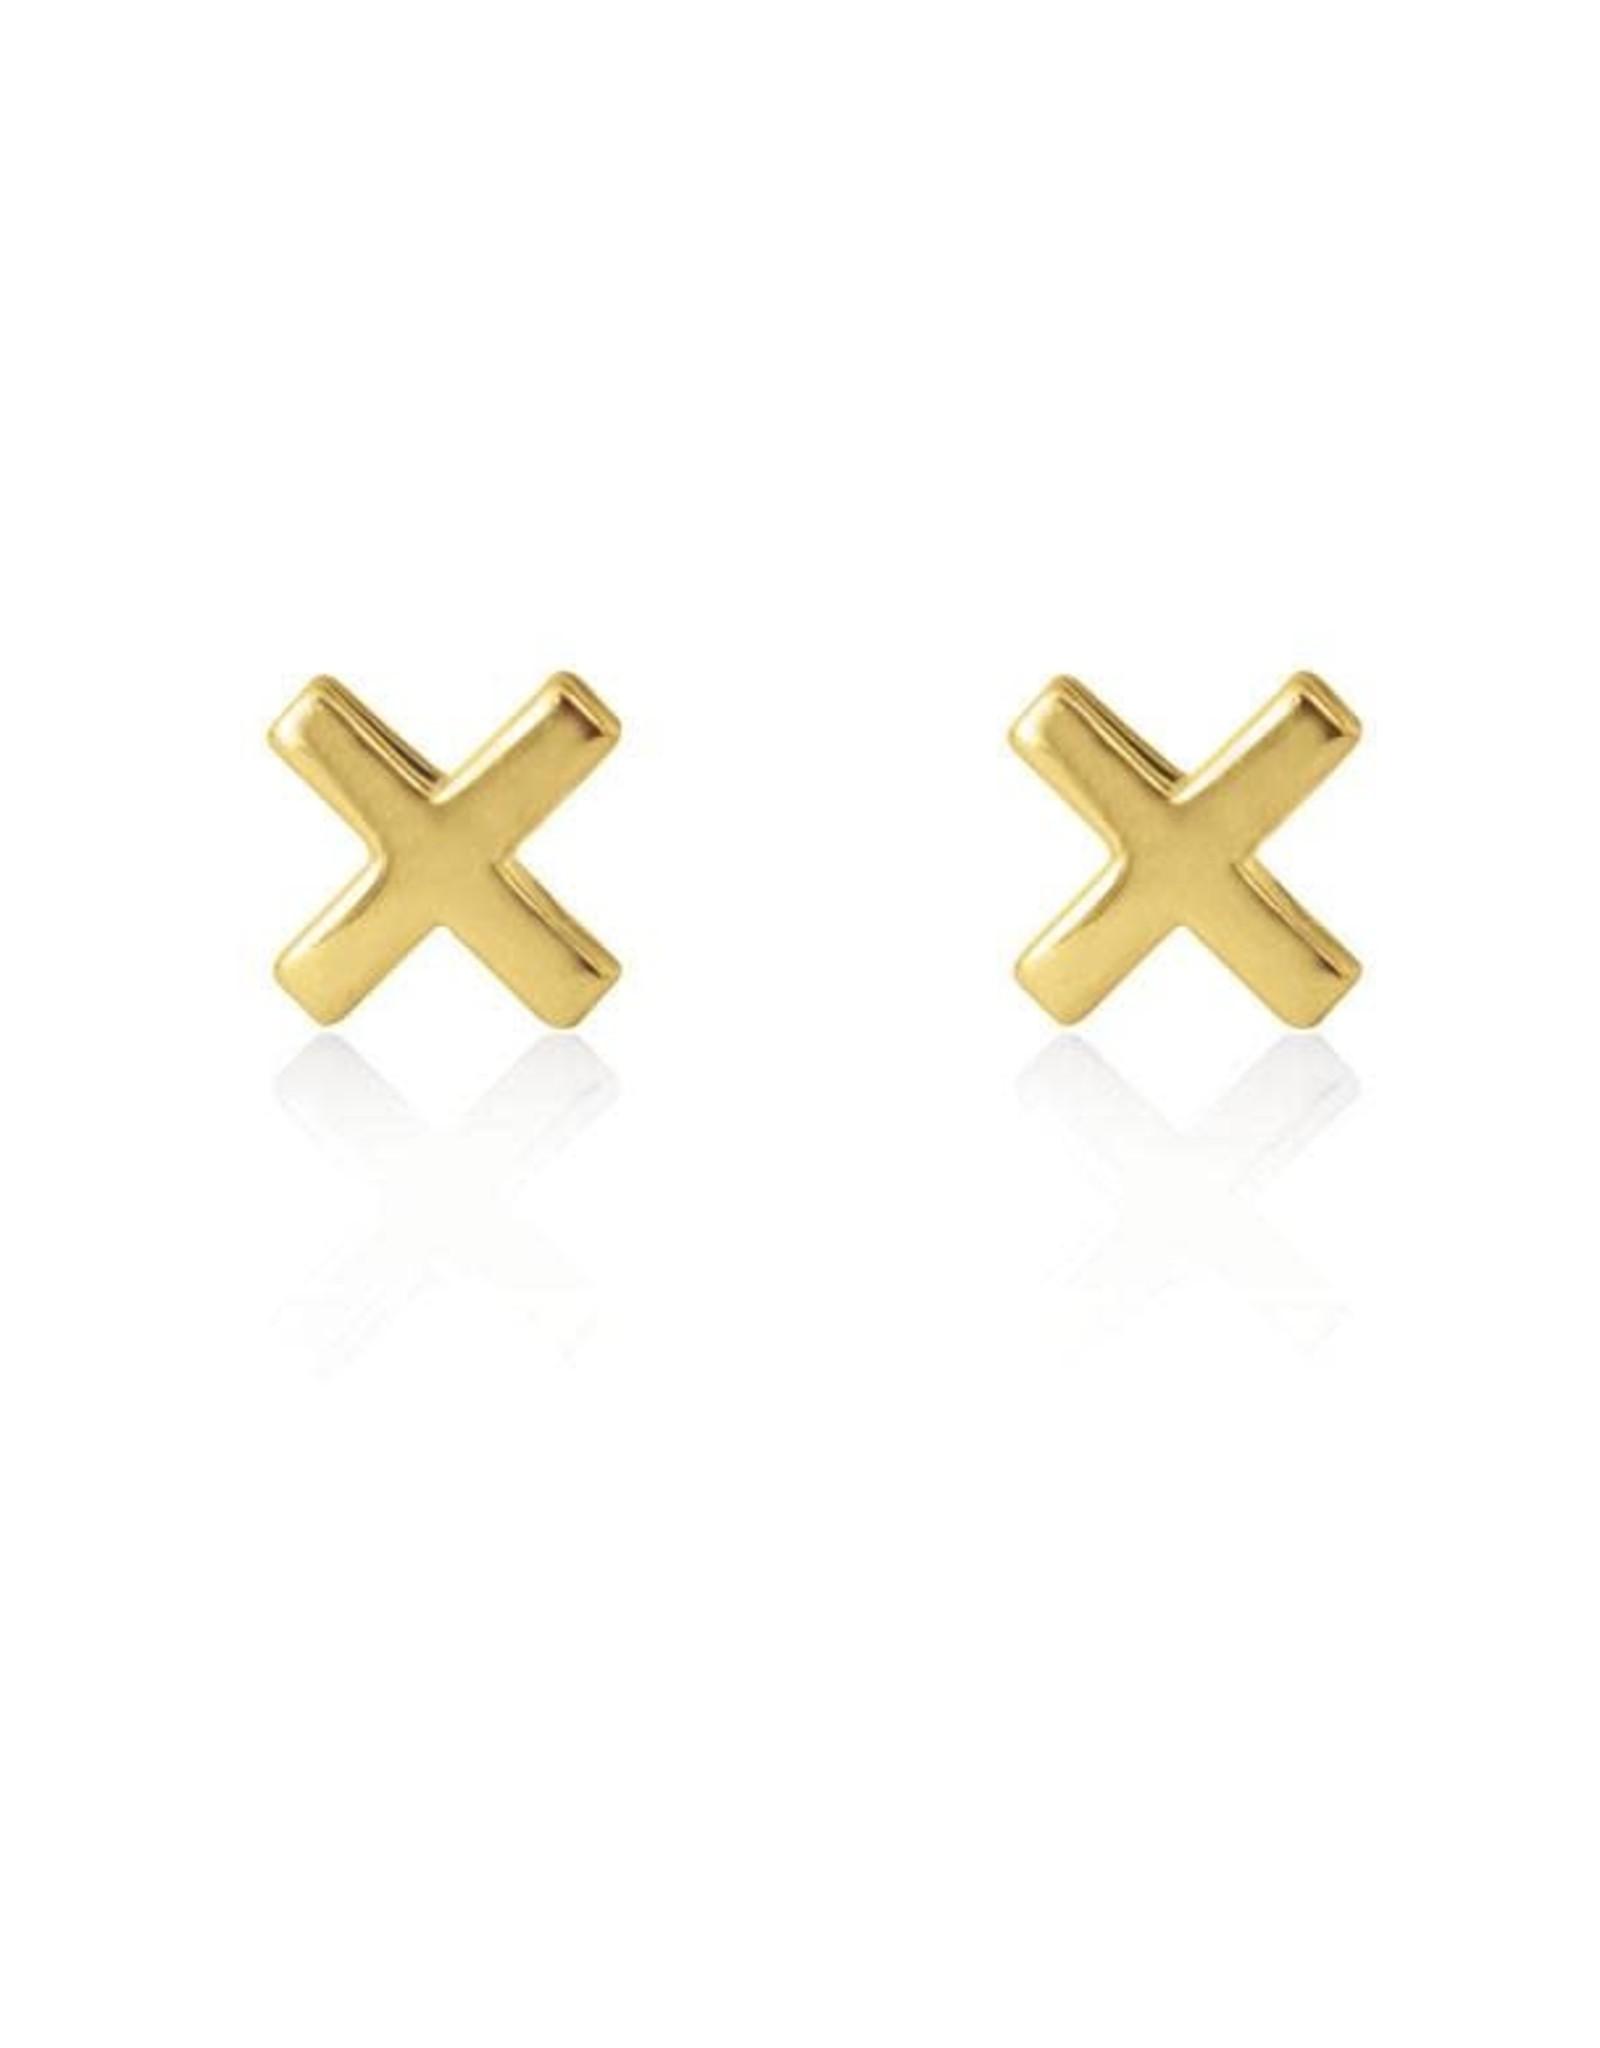 Linda Tahija Cross Stud Earrings, Gold